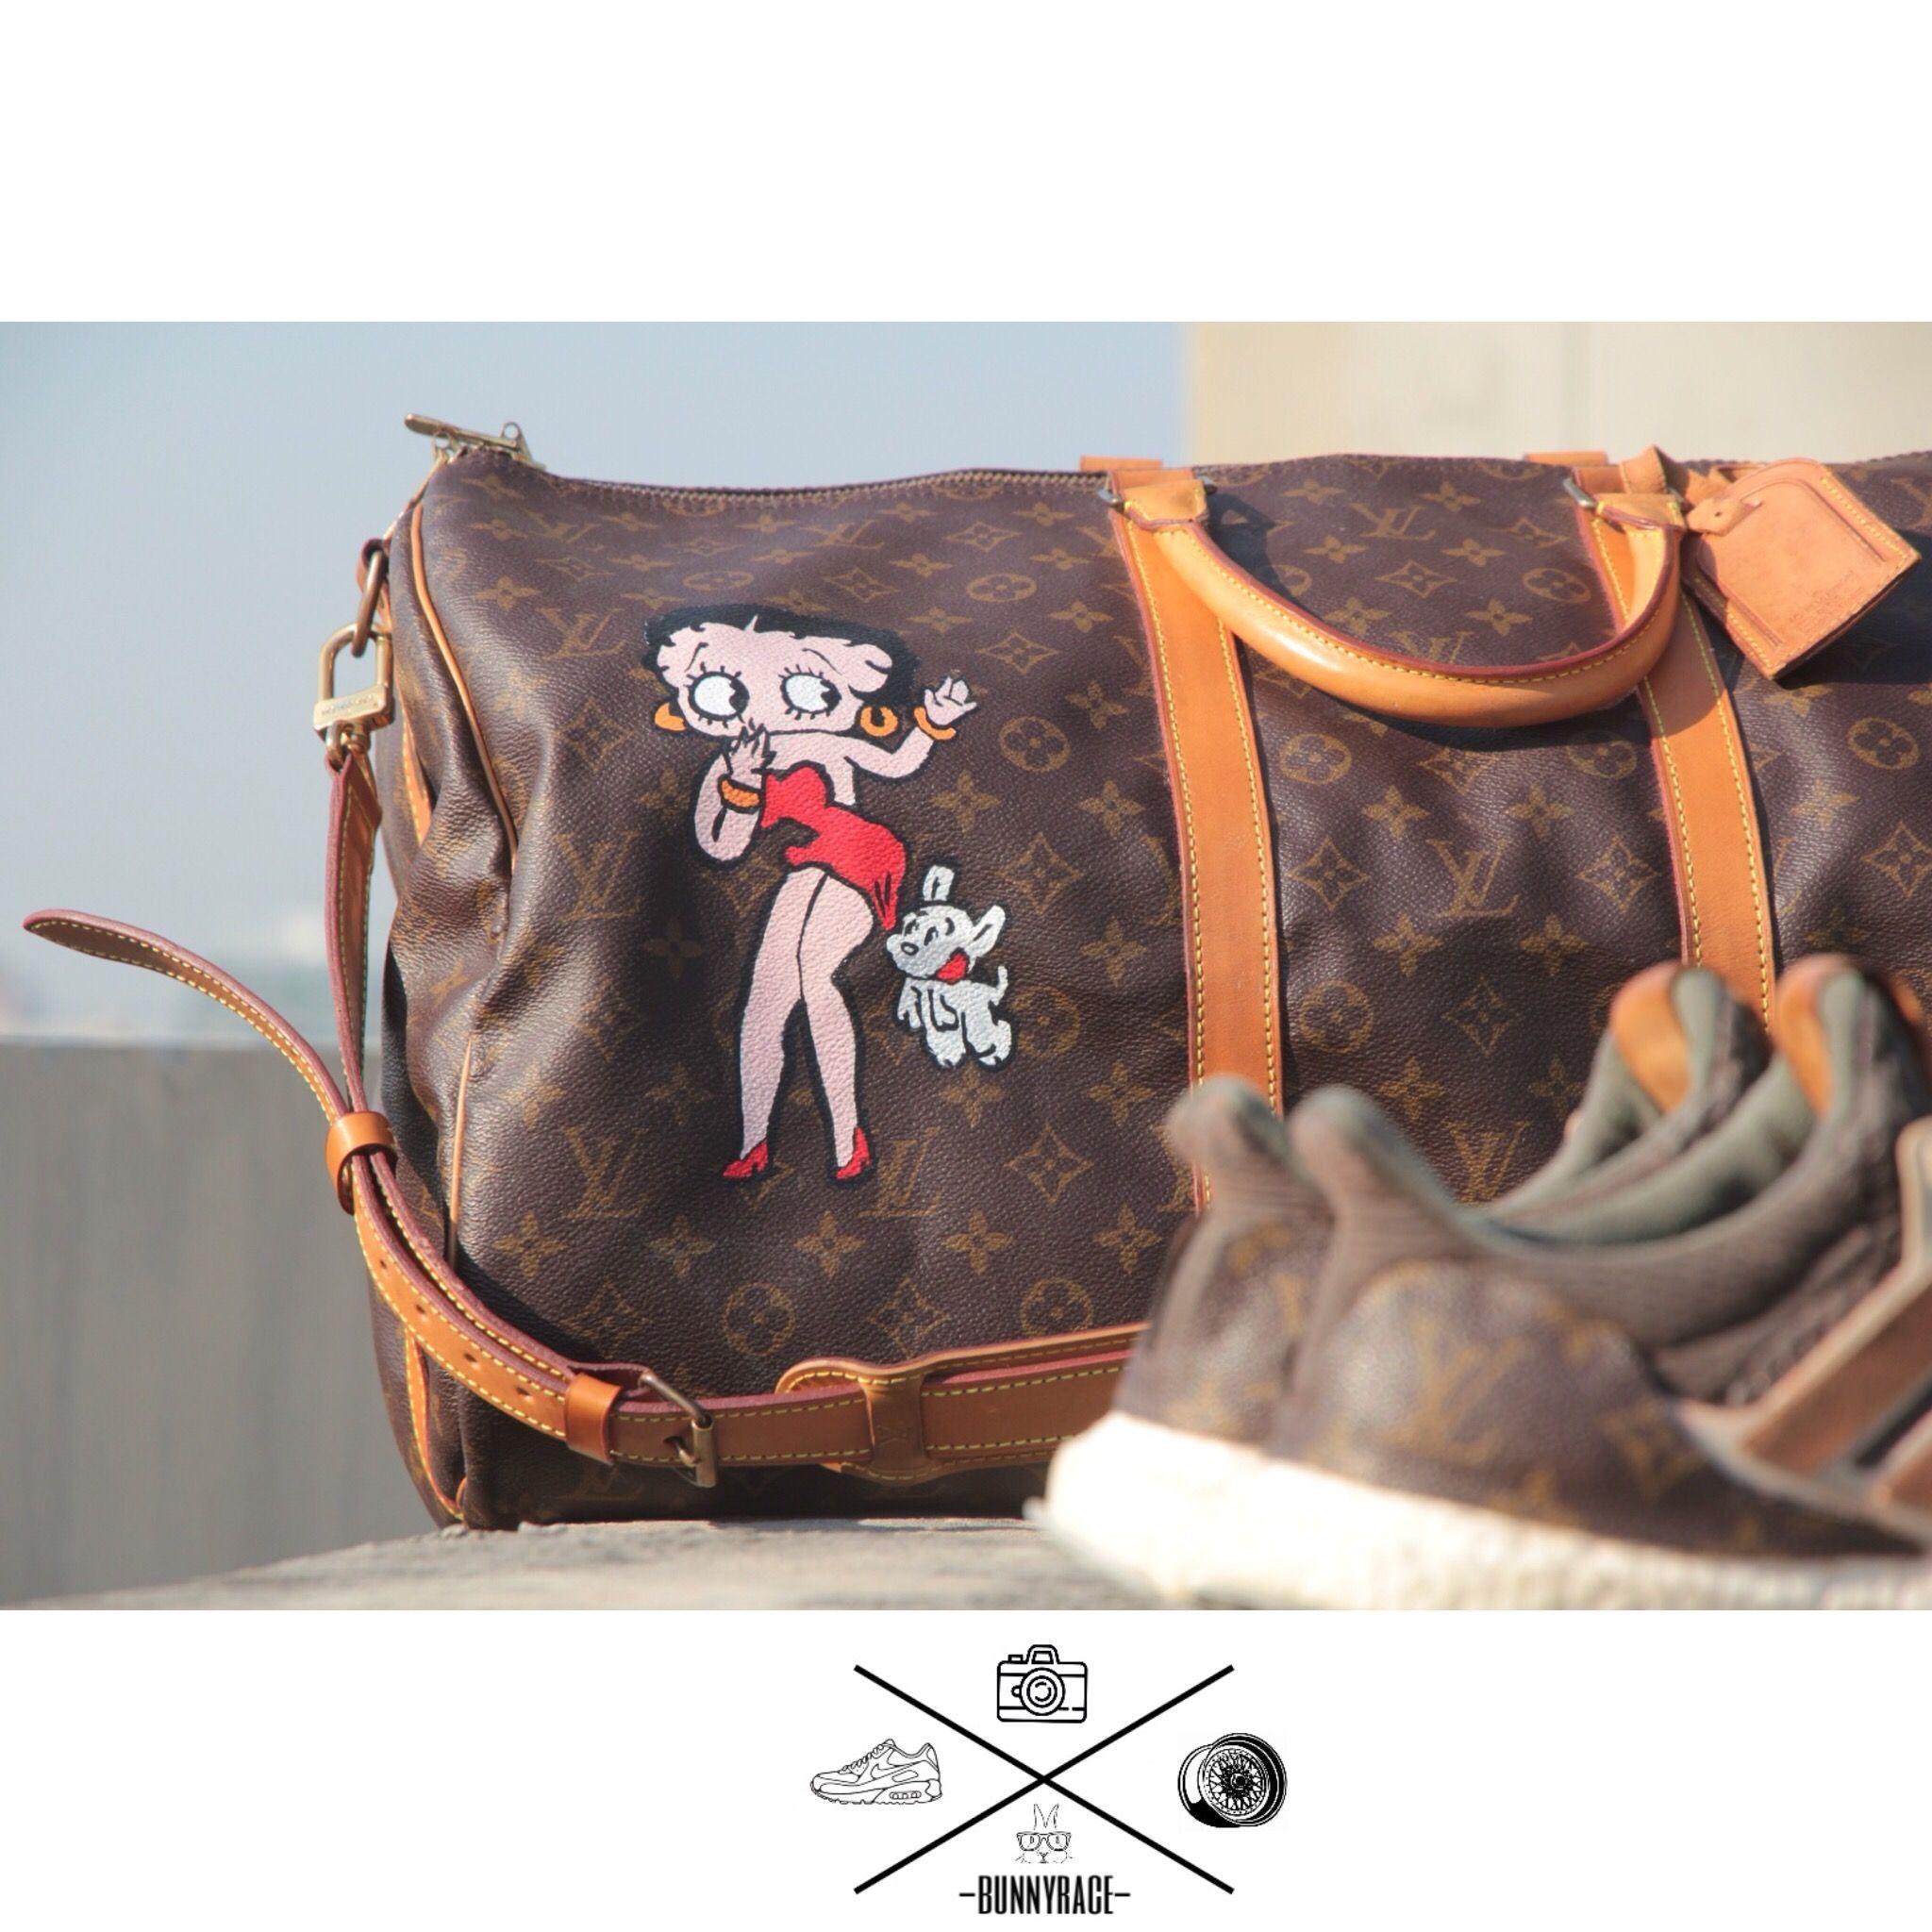 5788083181d0 Nice boston bag hands paint custom loved Betty Boop on Louis Vuitton keepall